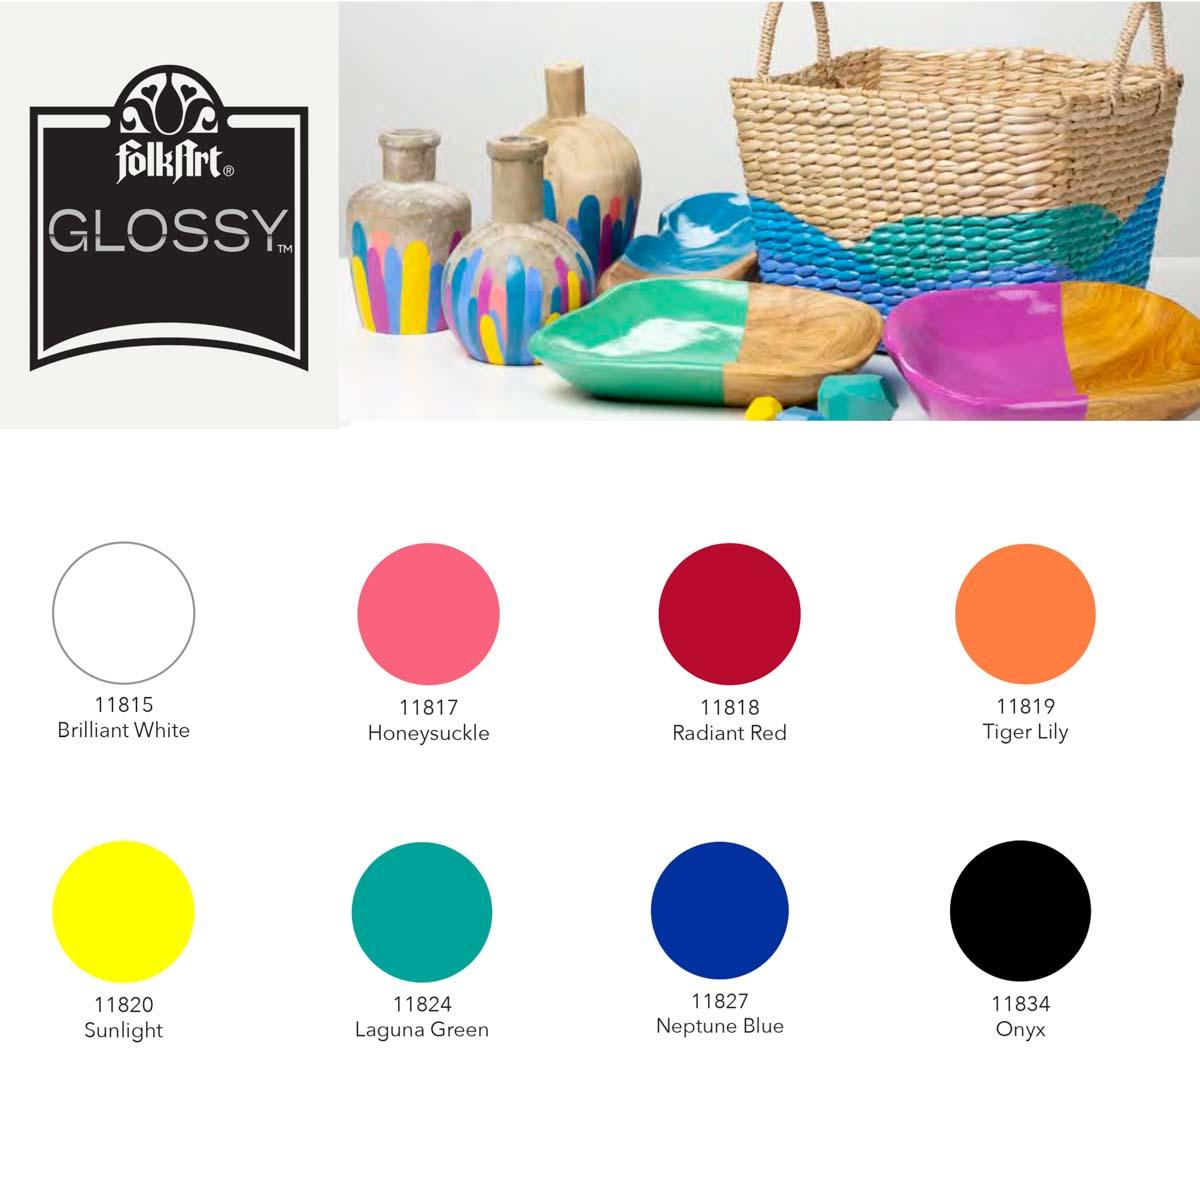 FolkArt ® Glossy Acrylic Paint Set 8 pc - 44509